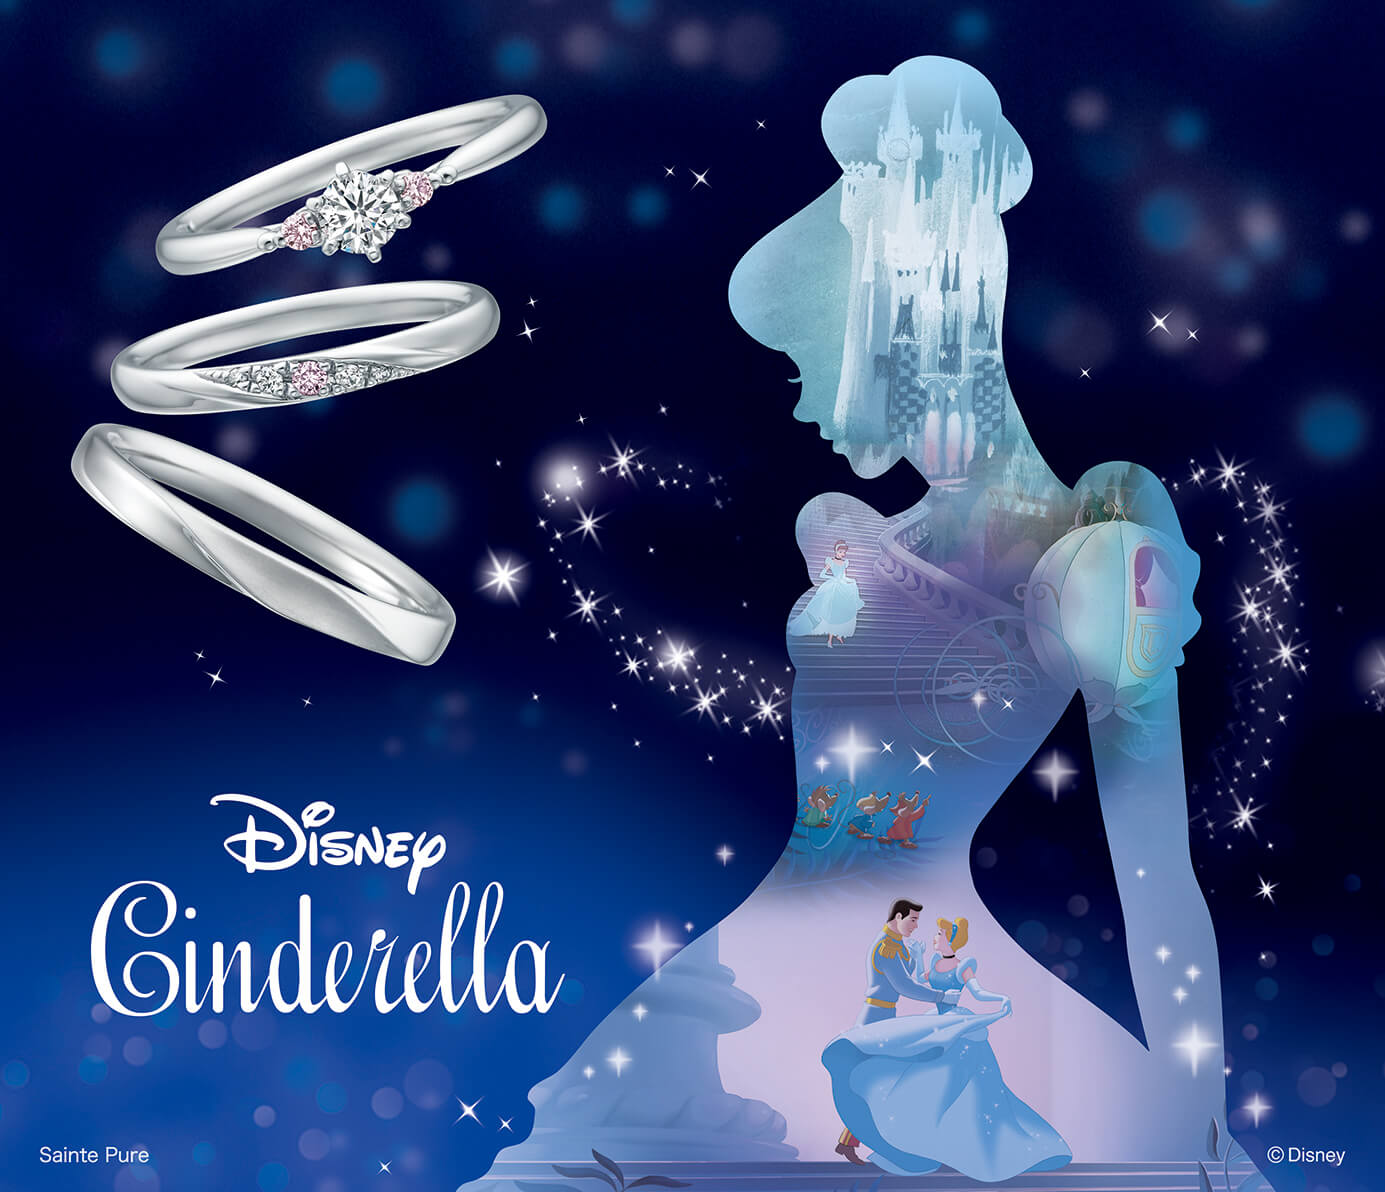 Disneyシンデレラ2022の婚約指輪エンゲージリングと結婚指輪マリッジリングのpumpkicarriageパンプキンキャリッジn